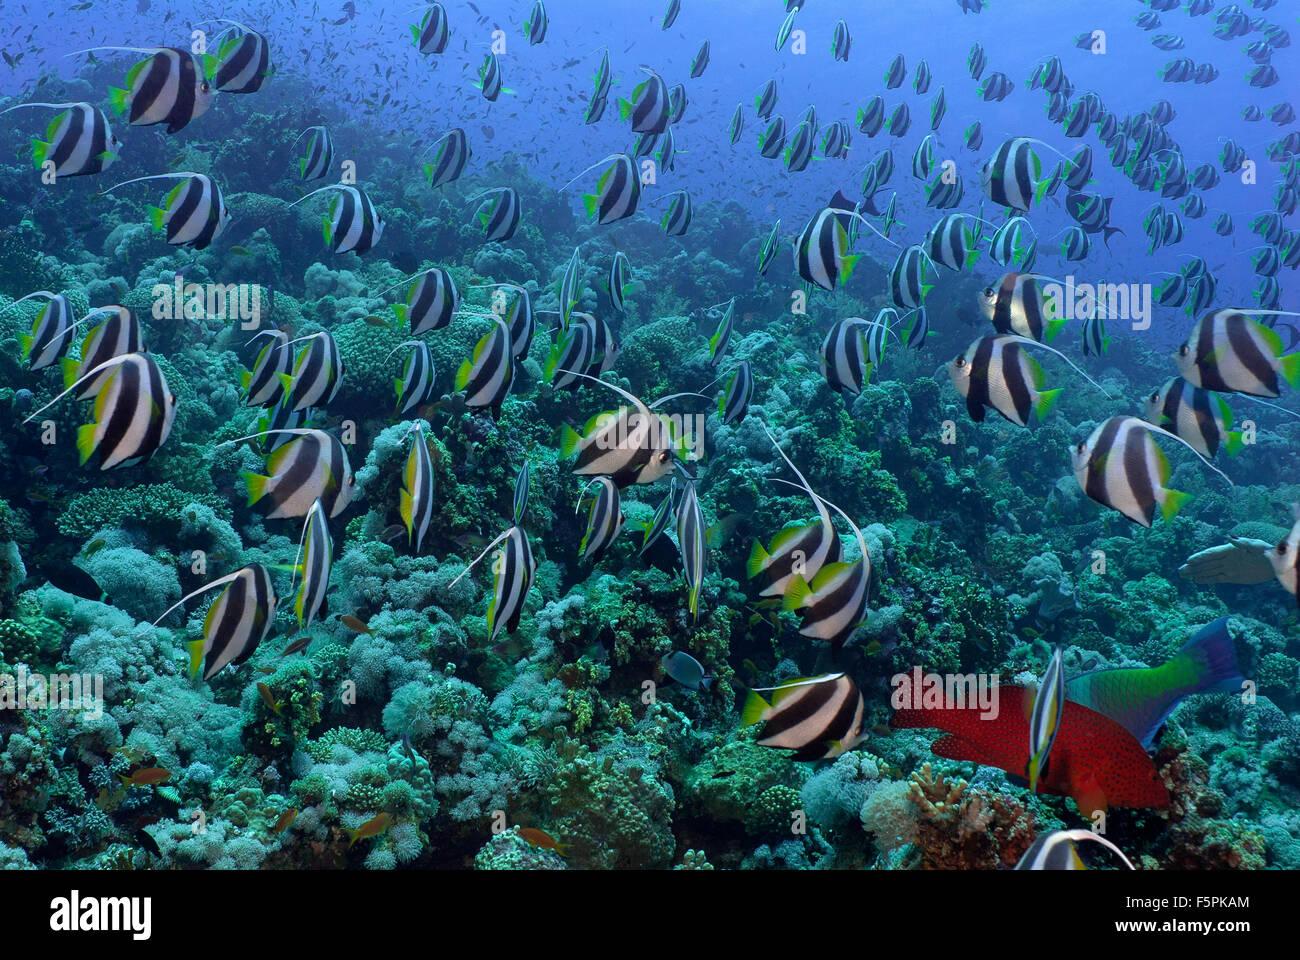 Schulzeit Bannerfish, Heniochhus Diphreutes, Chetodontidae, Tiran Island, Rotes Meer, Sharm el-Sheikh, Ägypten Stockbild